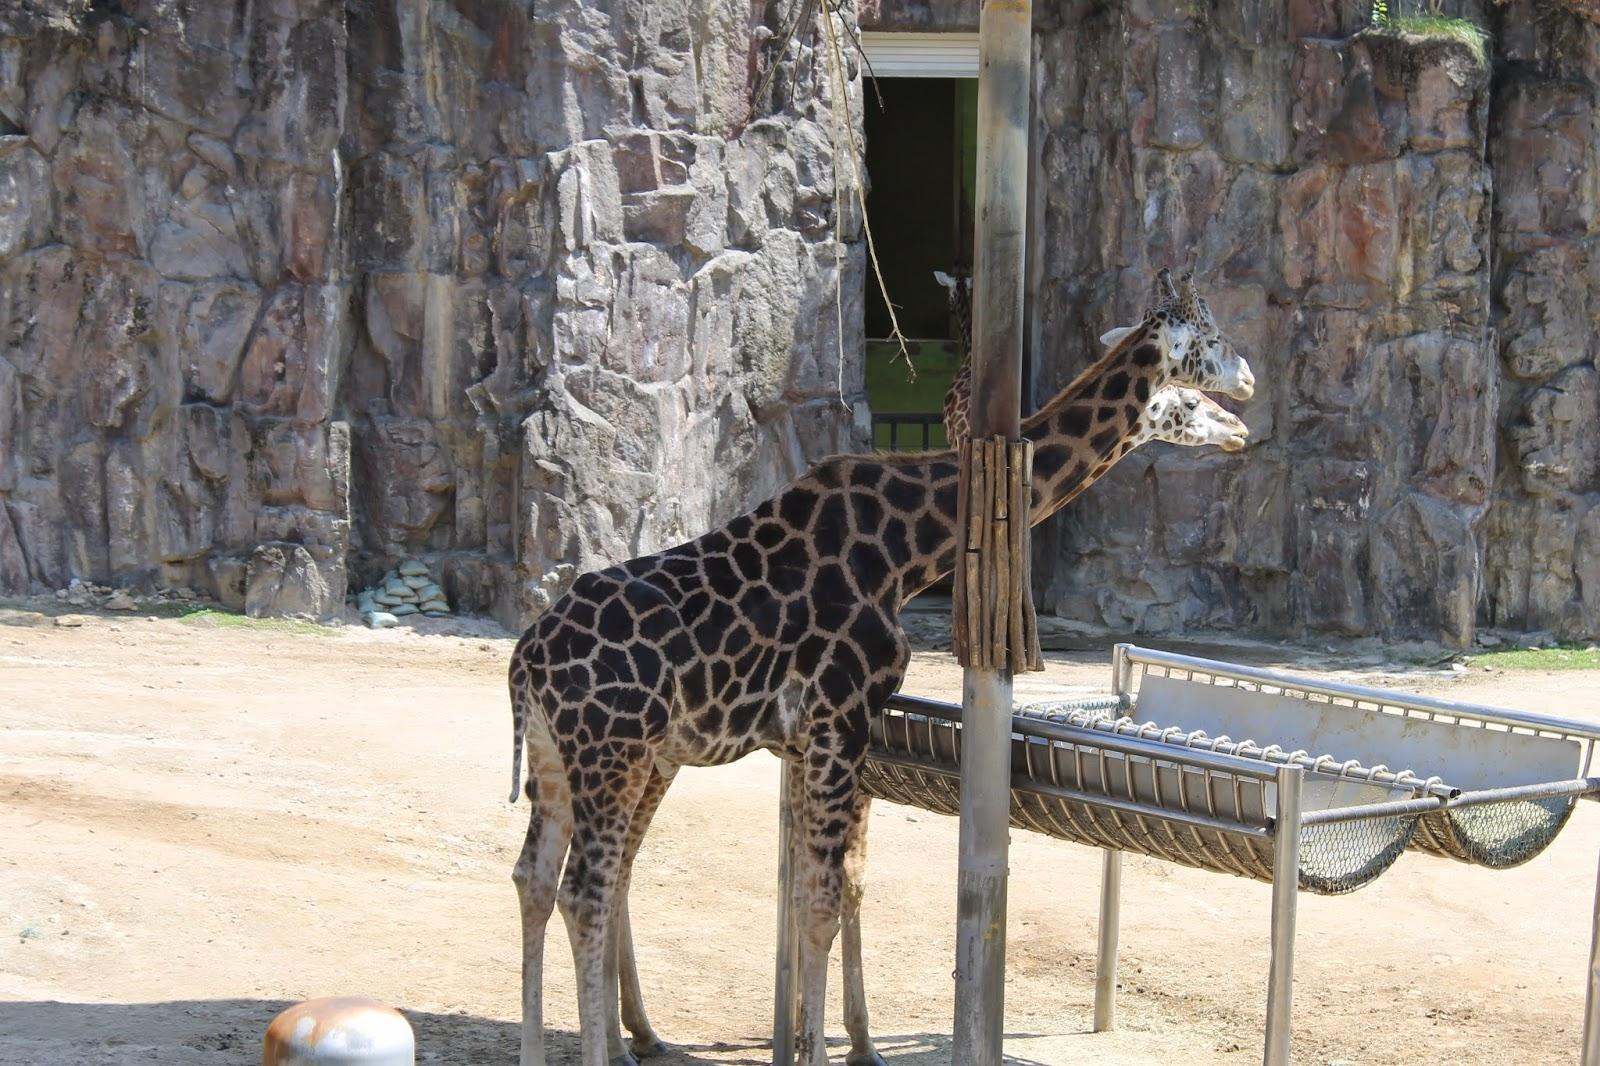 Seoul Zoo, Seoul, зоопарк в сеуле, сеул, корея, зоопарк, жираф